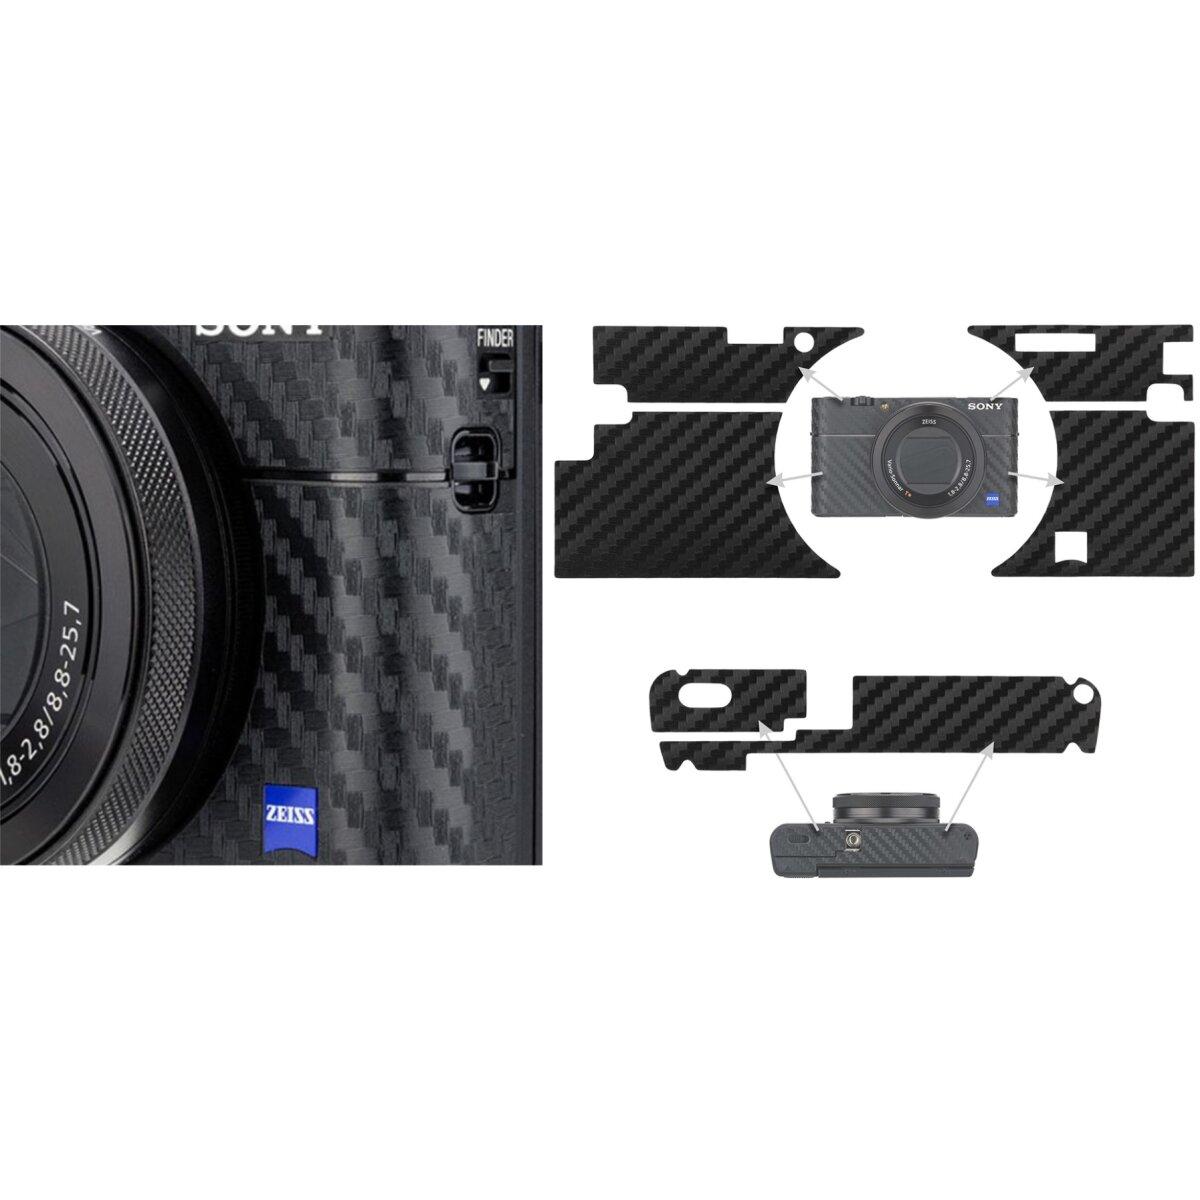 Impulsfoto KIWIFOTOS Anti-Kratzer-Schutzfolie | Kohlefaserstruktur | Besserer Grip | Hochwertiges 3M-Material | Kompatibel für Sony RX100 V, RX100 VA, RX100 III | Modell: KS-RX100VCF